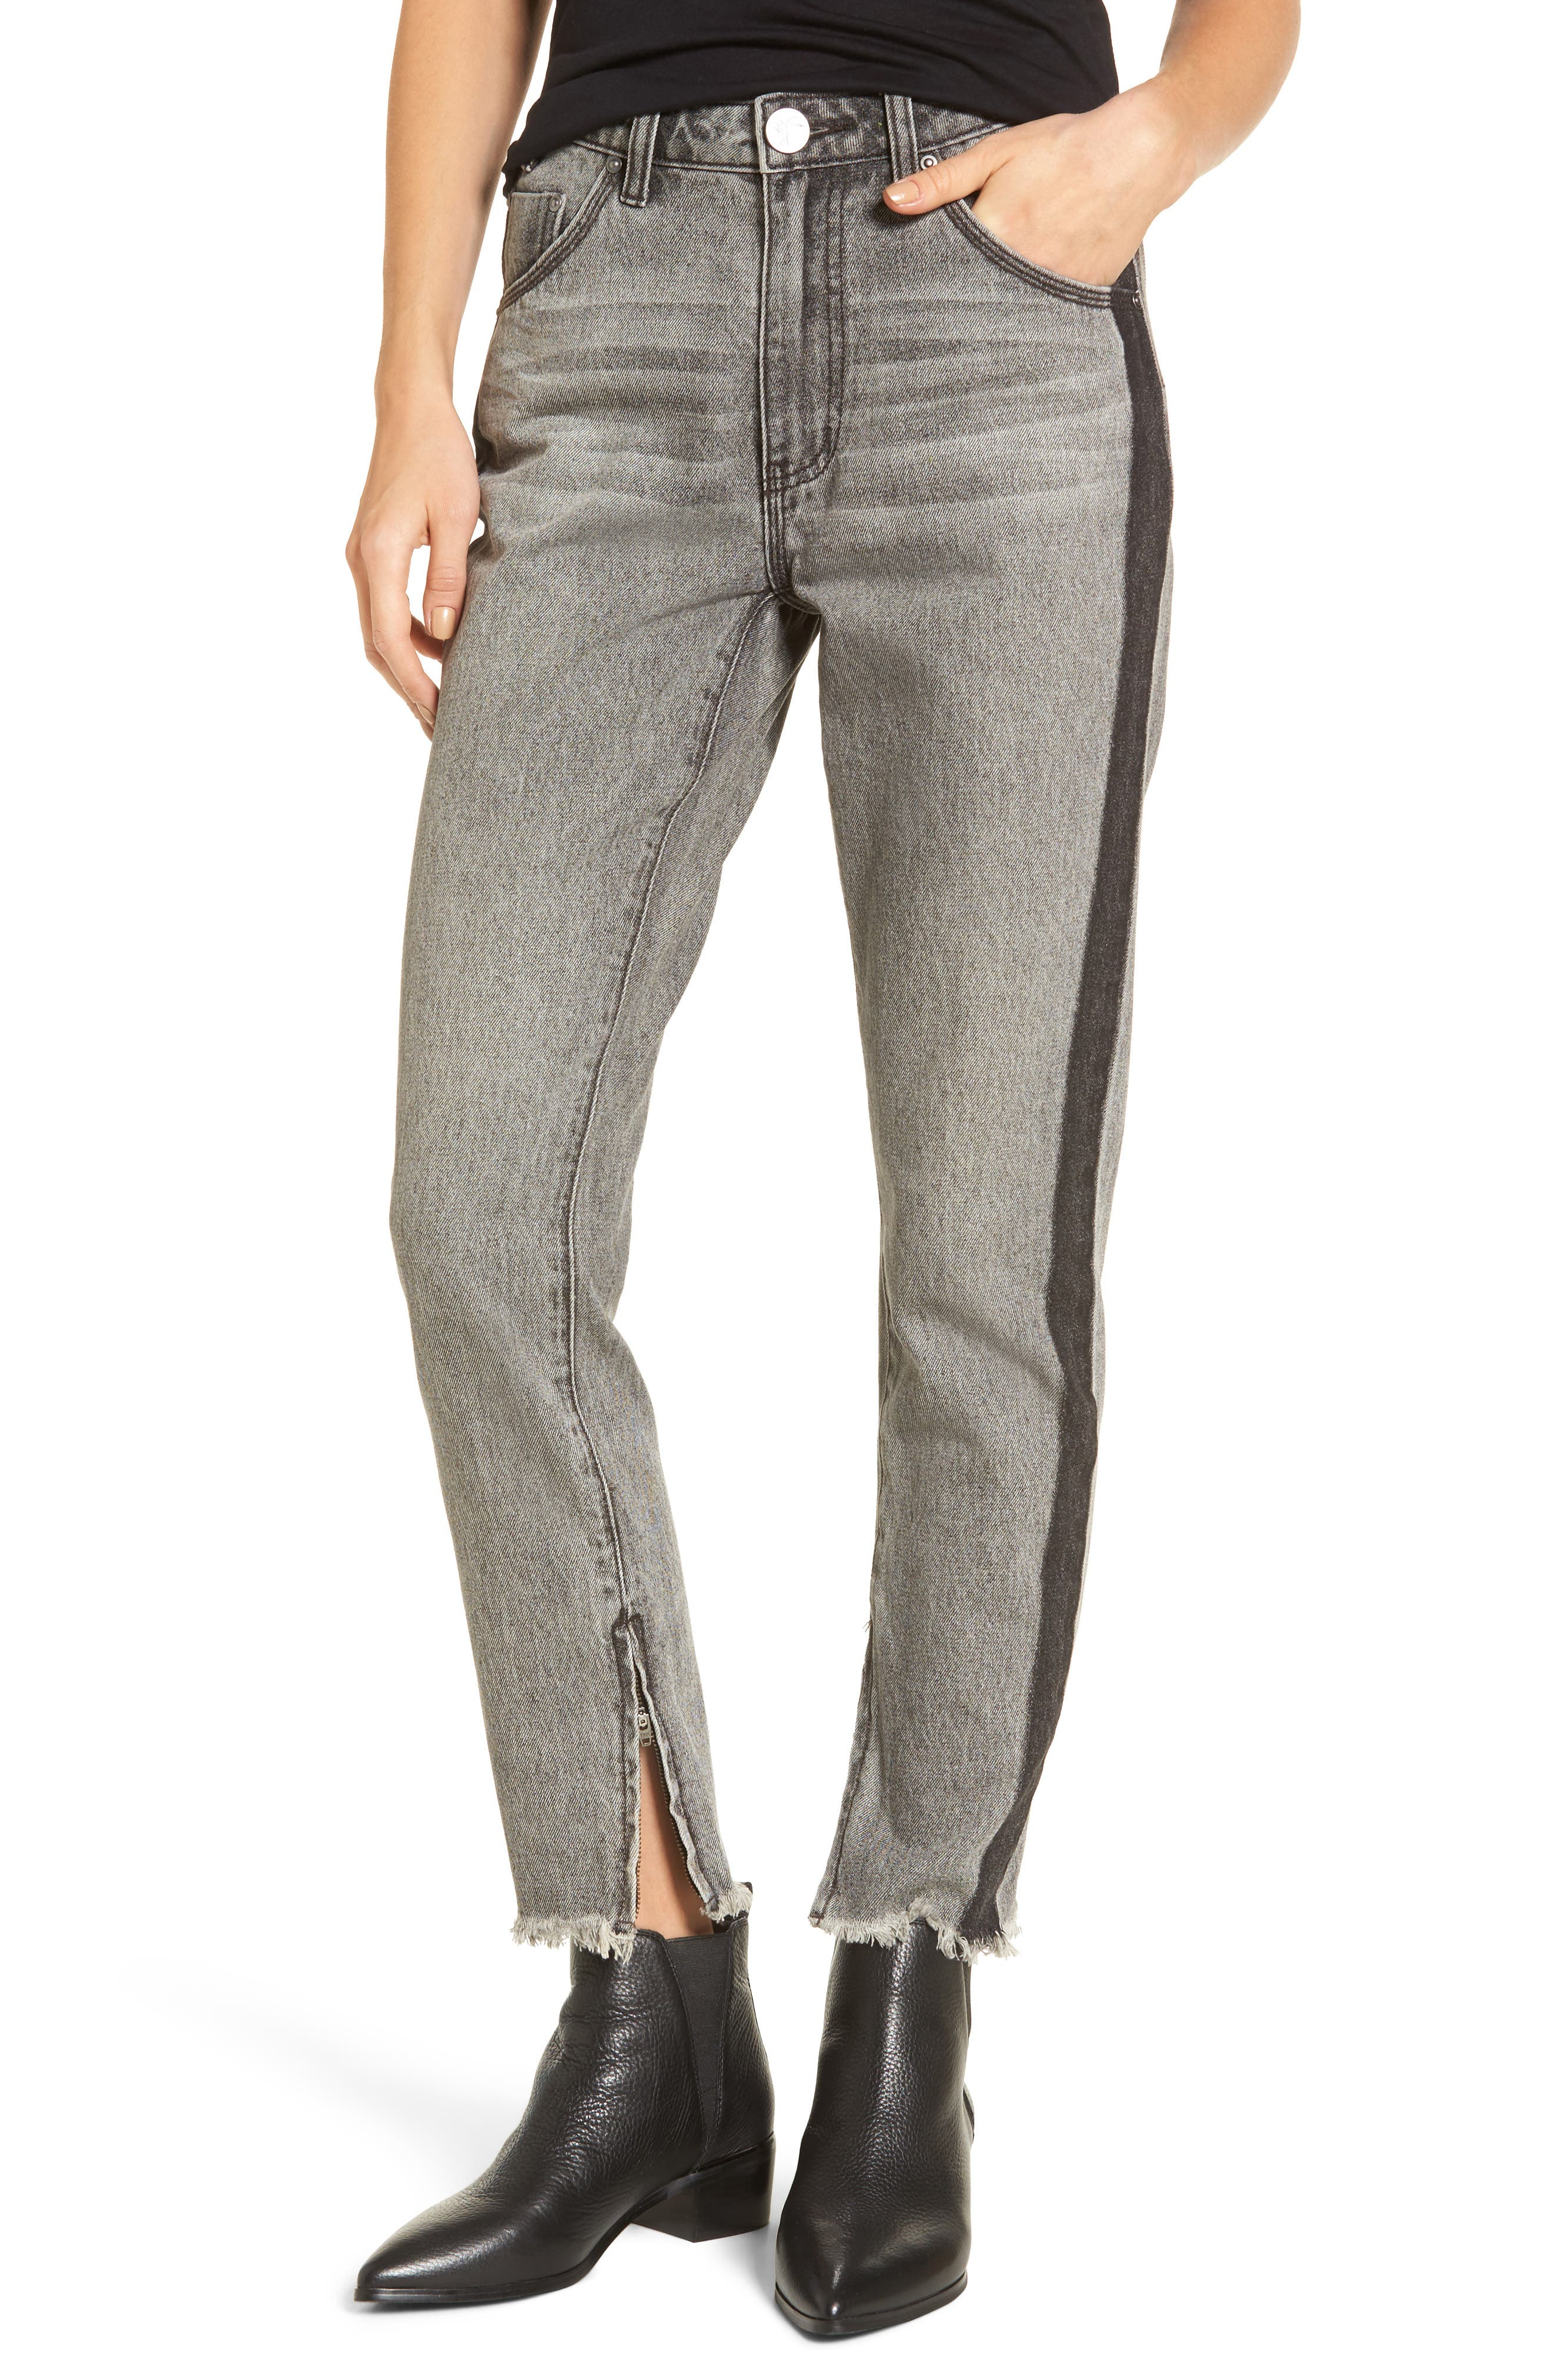 Freebirds High Waist Skinny Jeans,                         Main,                         color, 060